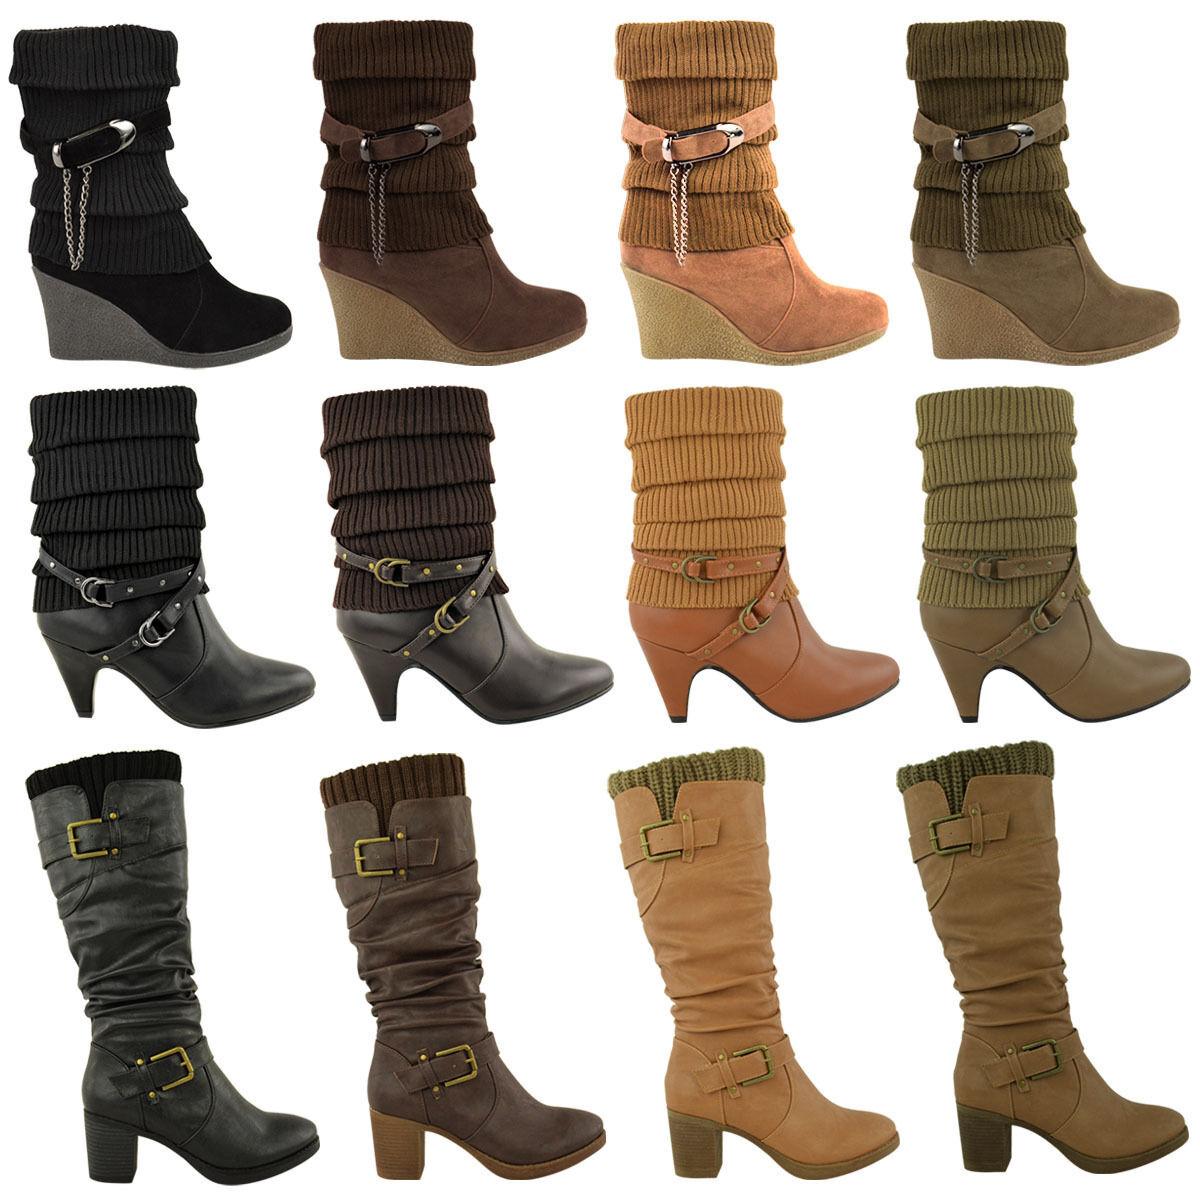 LADIES femmes MID CALF KNEE HIGH HEEL WINTER ANKLE SOCK bottes BIKER chaussures Taille